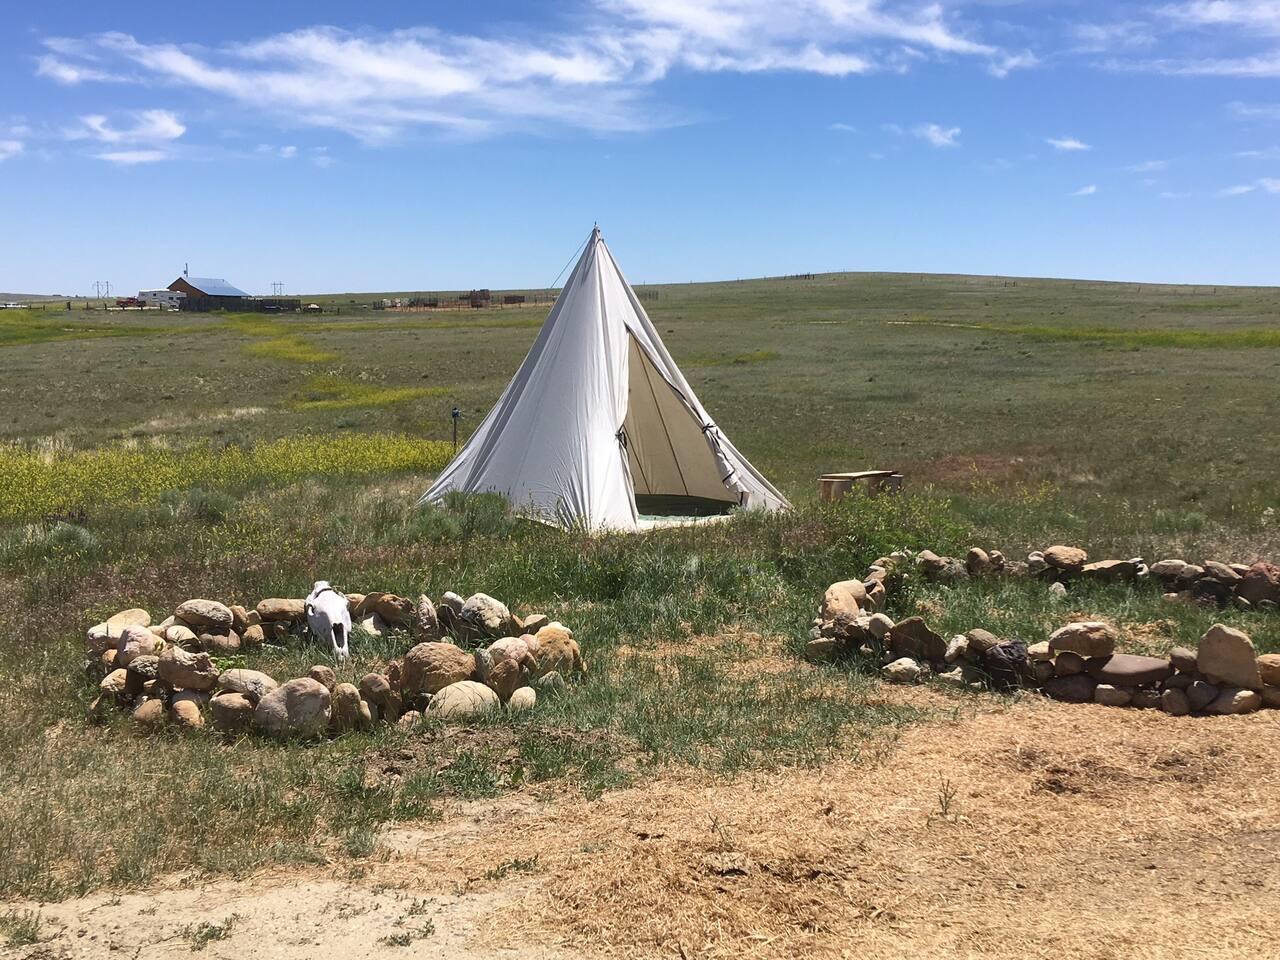 teepee-camping-lodge-buffalo-wy